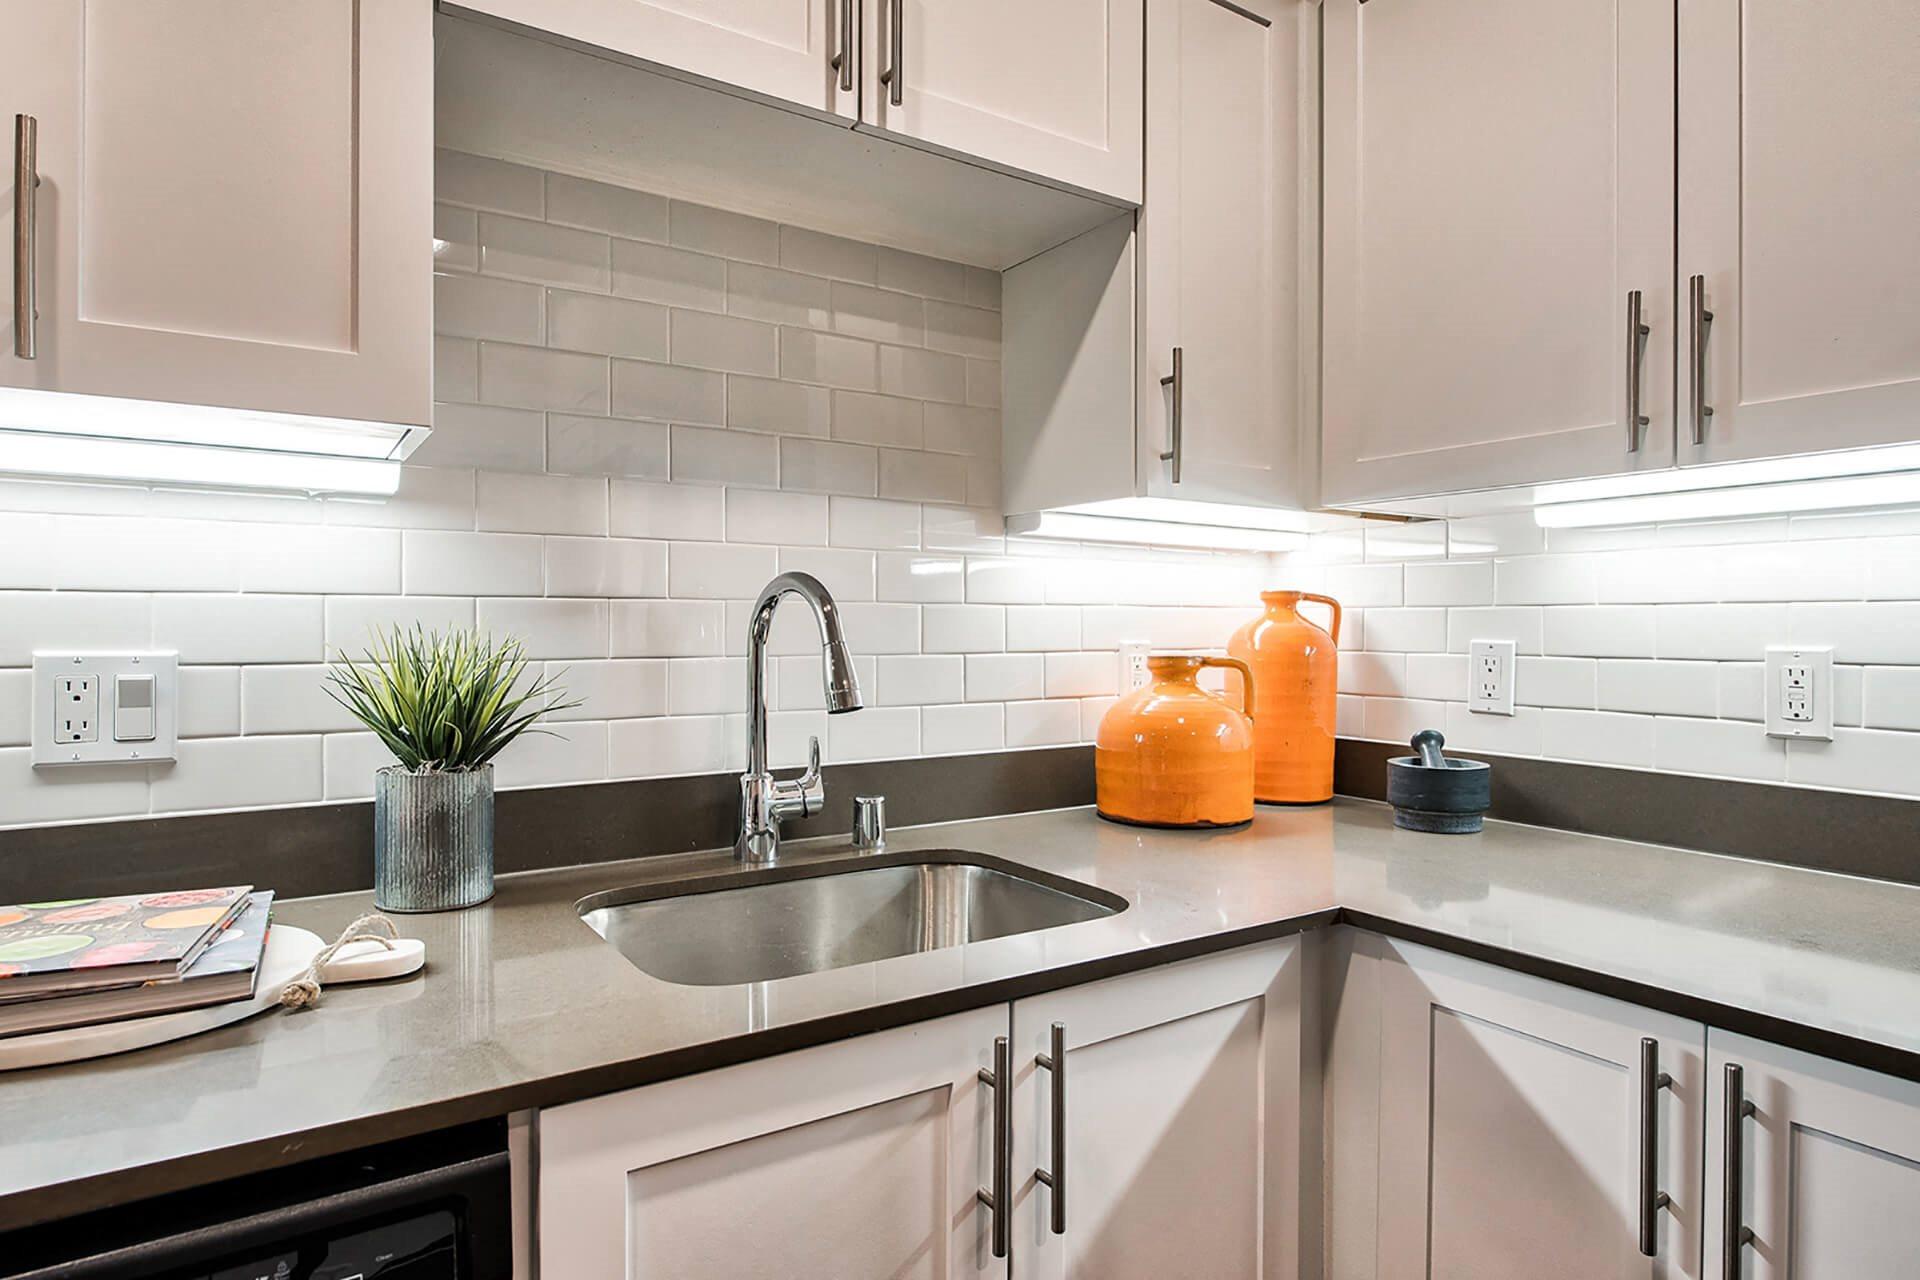 Beautiful backsplash tile in kitchen at Reflections by Windsor, 6332 E. Lake Sammamish Parkway NE, WA